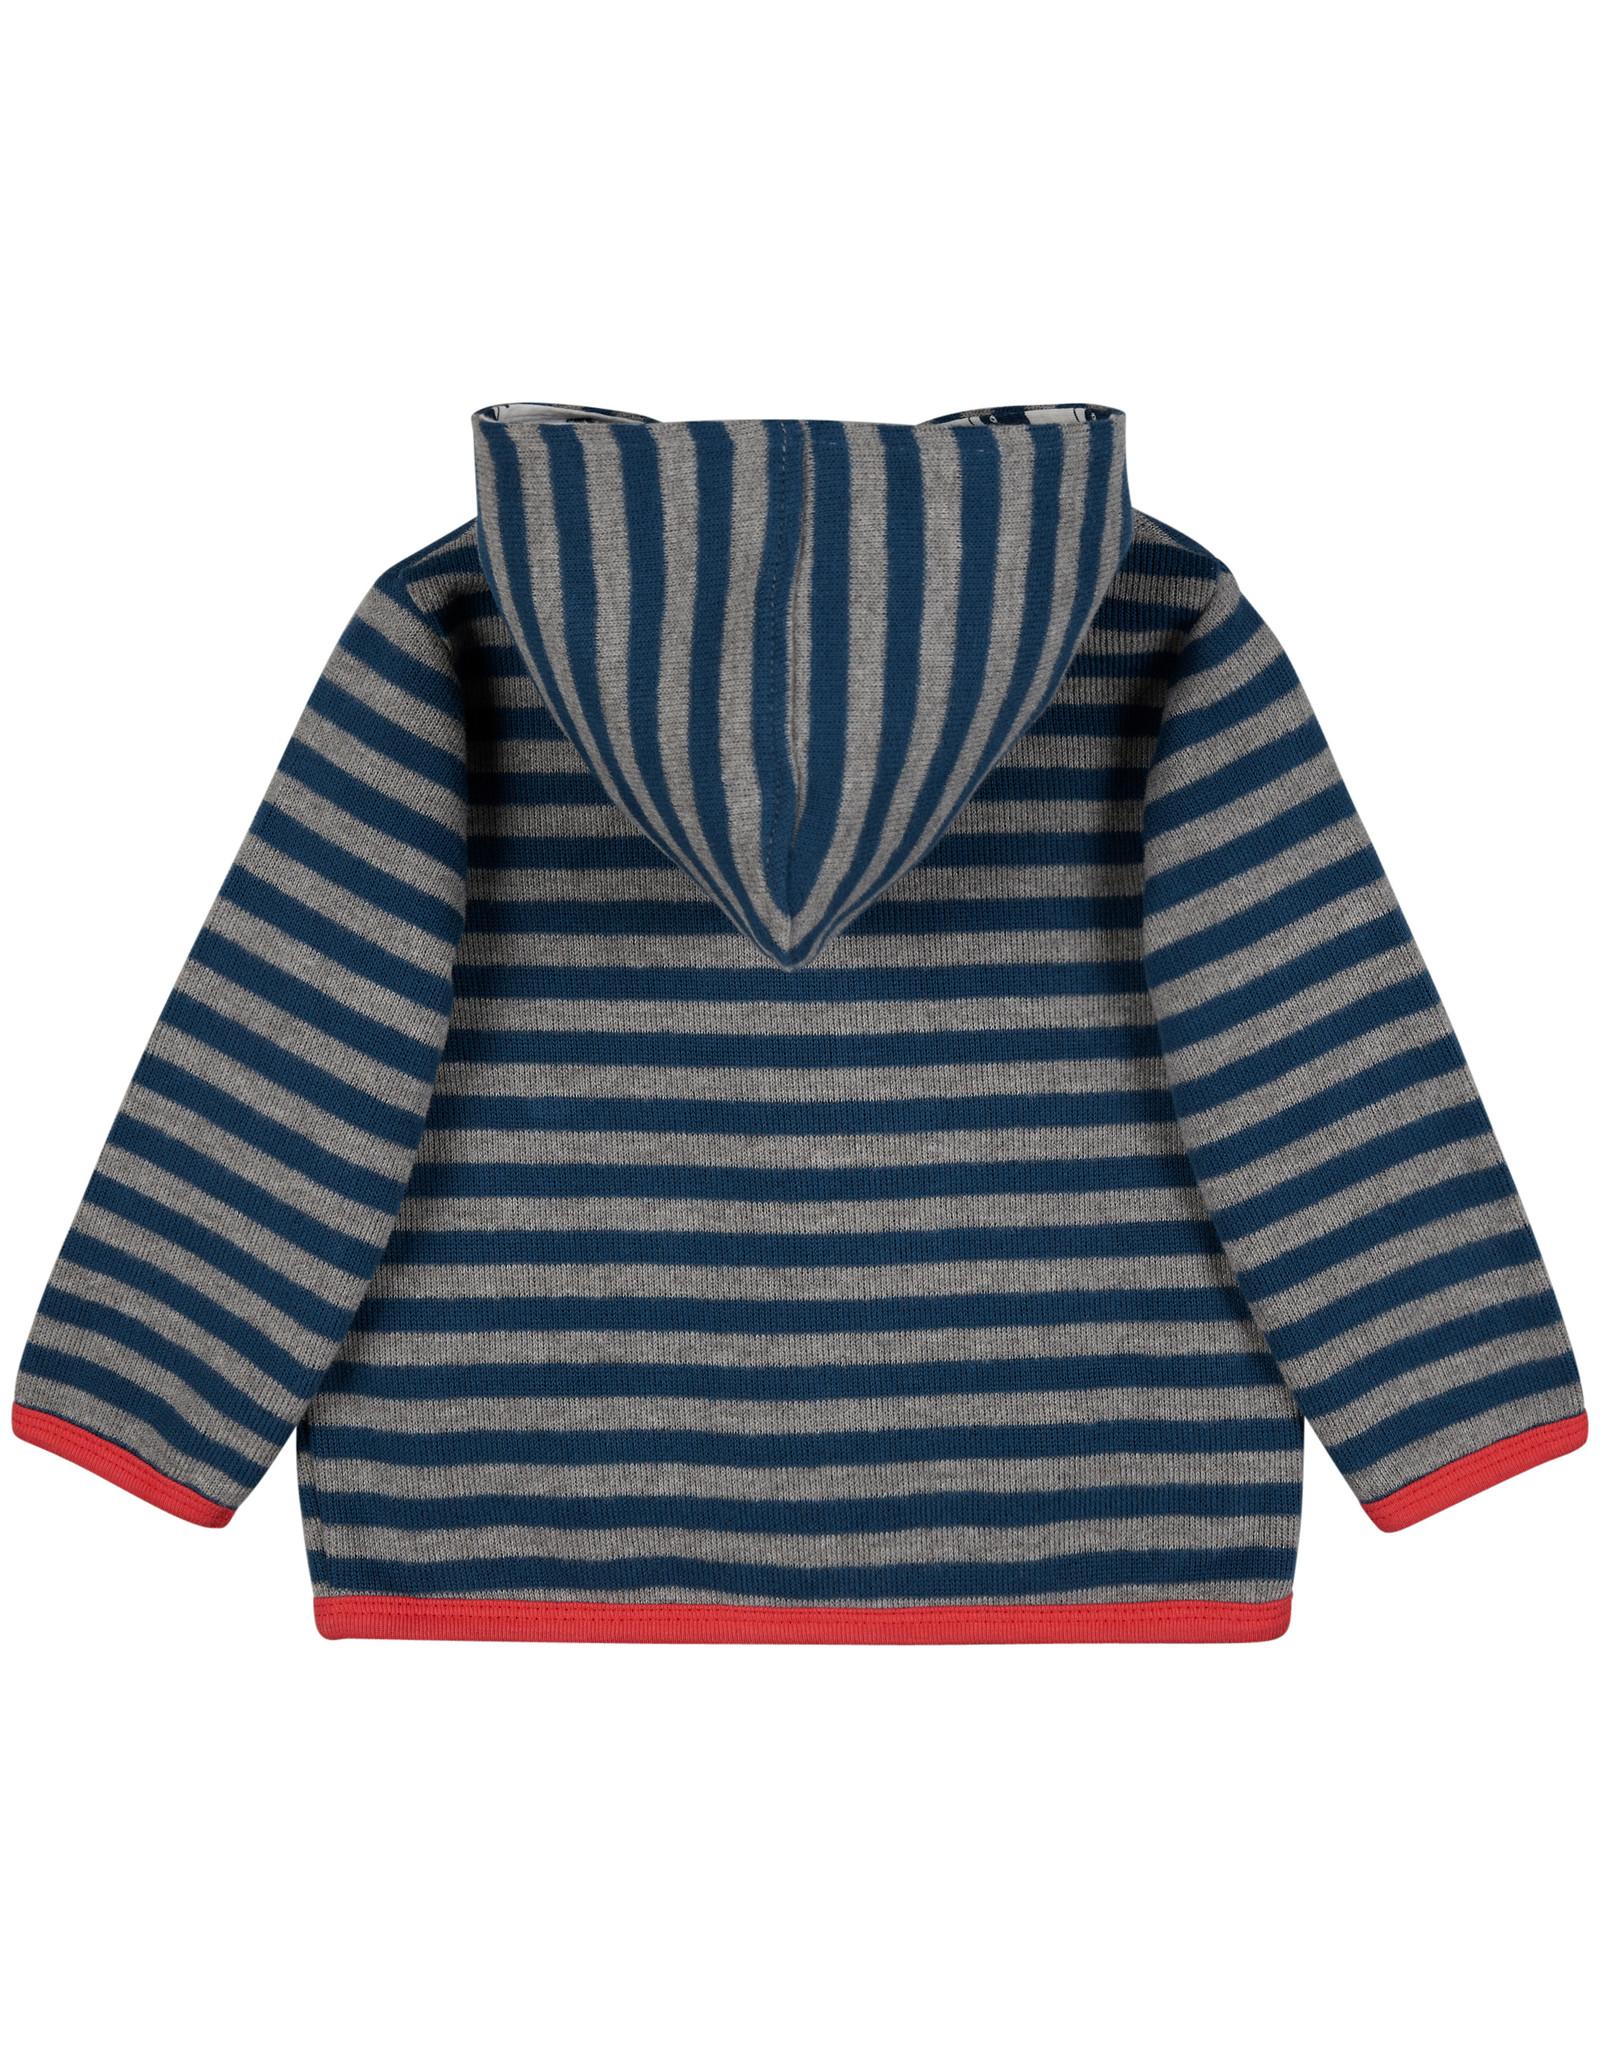 loud+proud Children's coat - blue grey striped